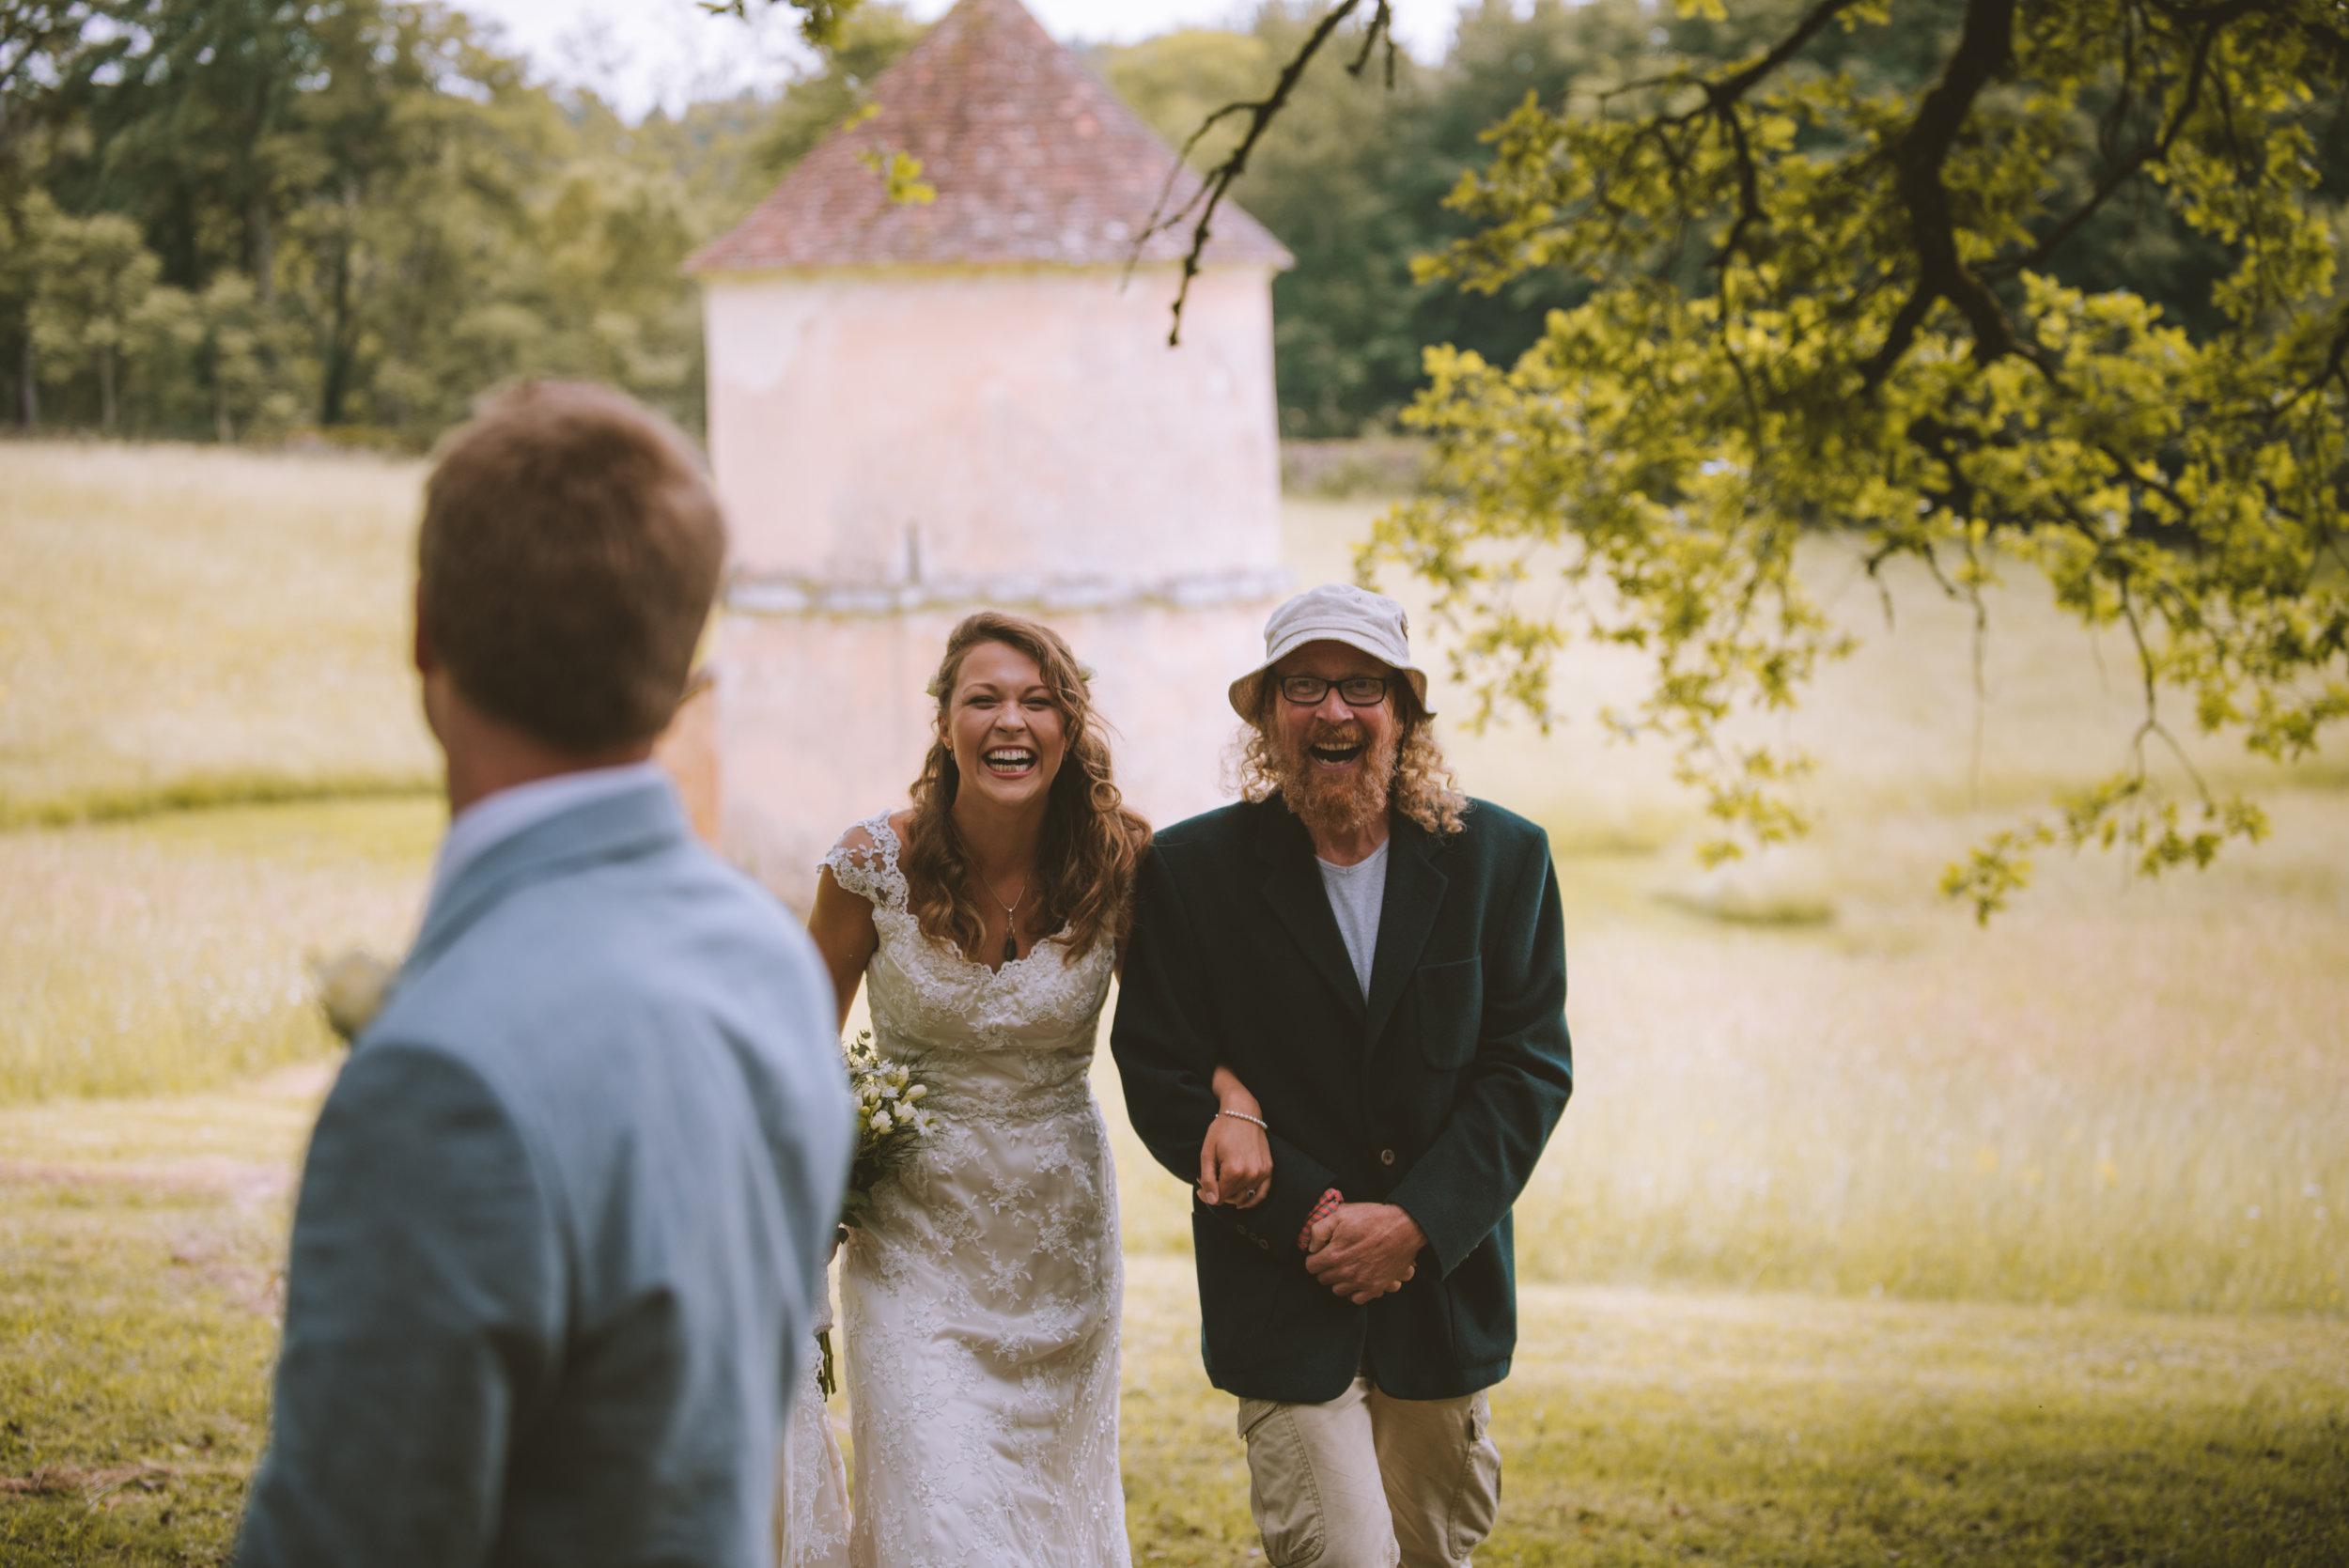 dordogne-wedding-photographer-mark-shaw-17.jpg